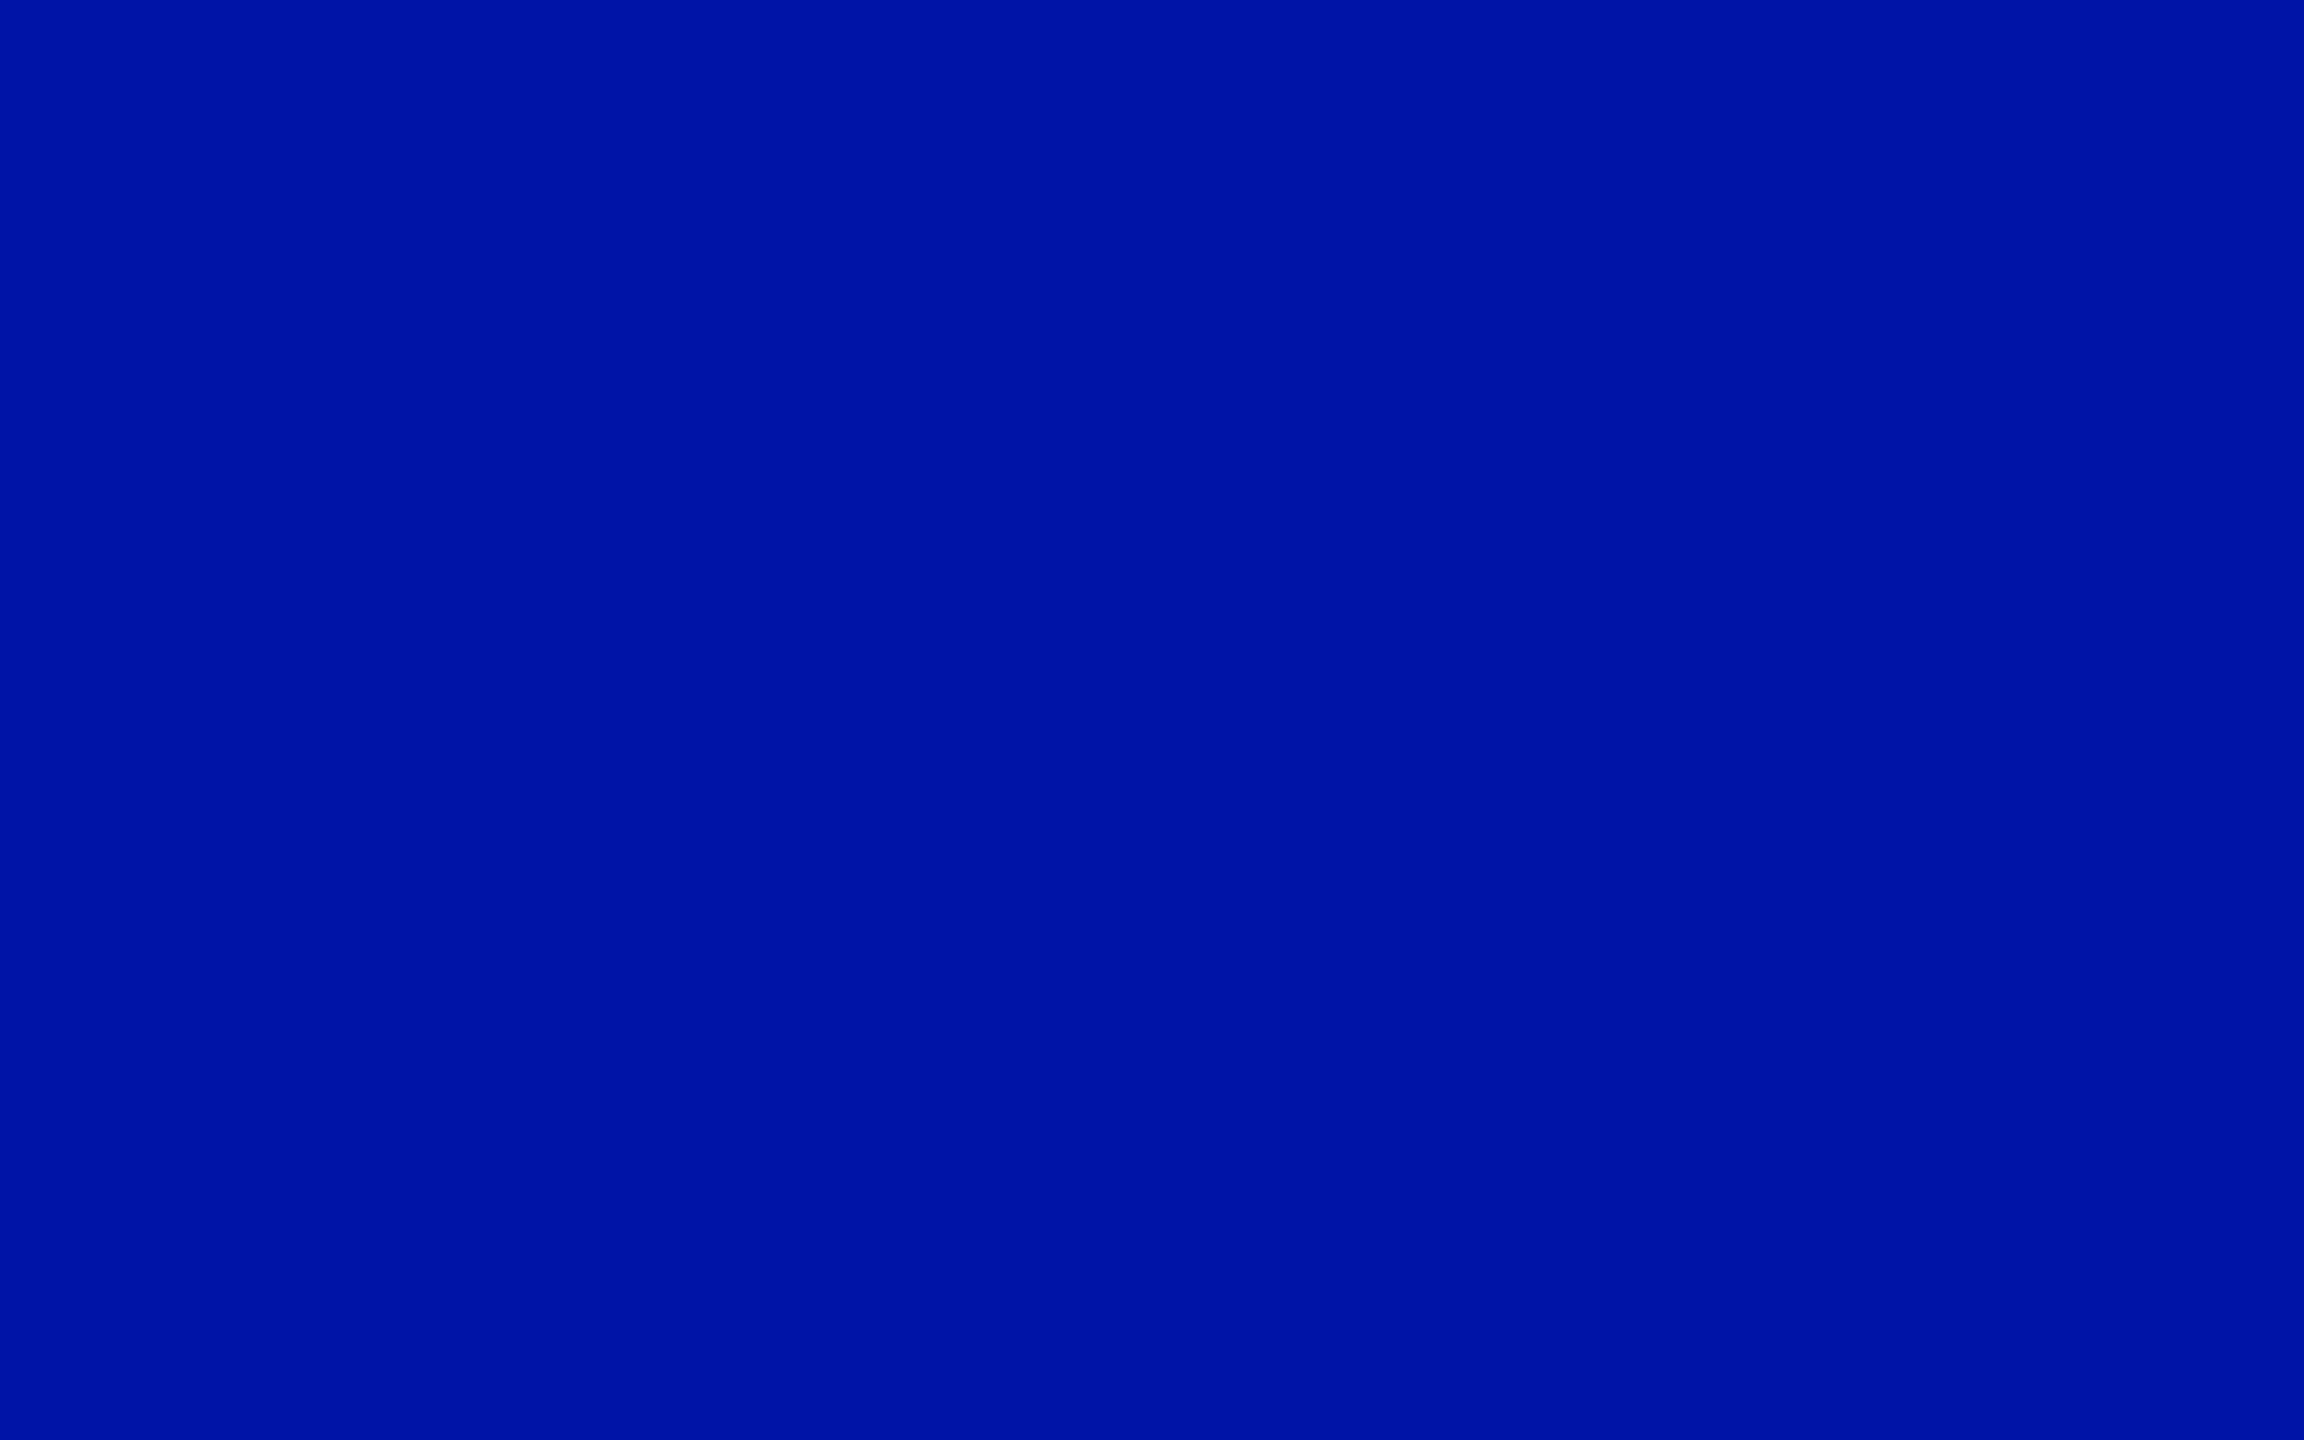 2304x1440 Zaffre Solid Color Background